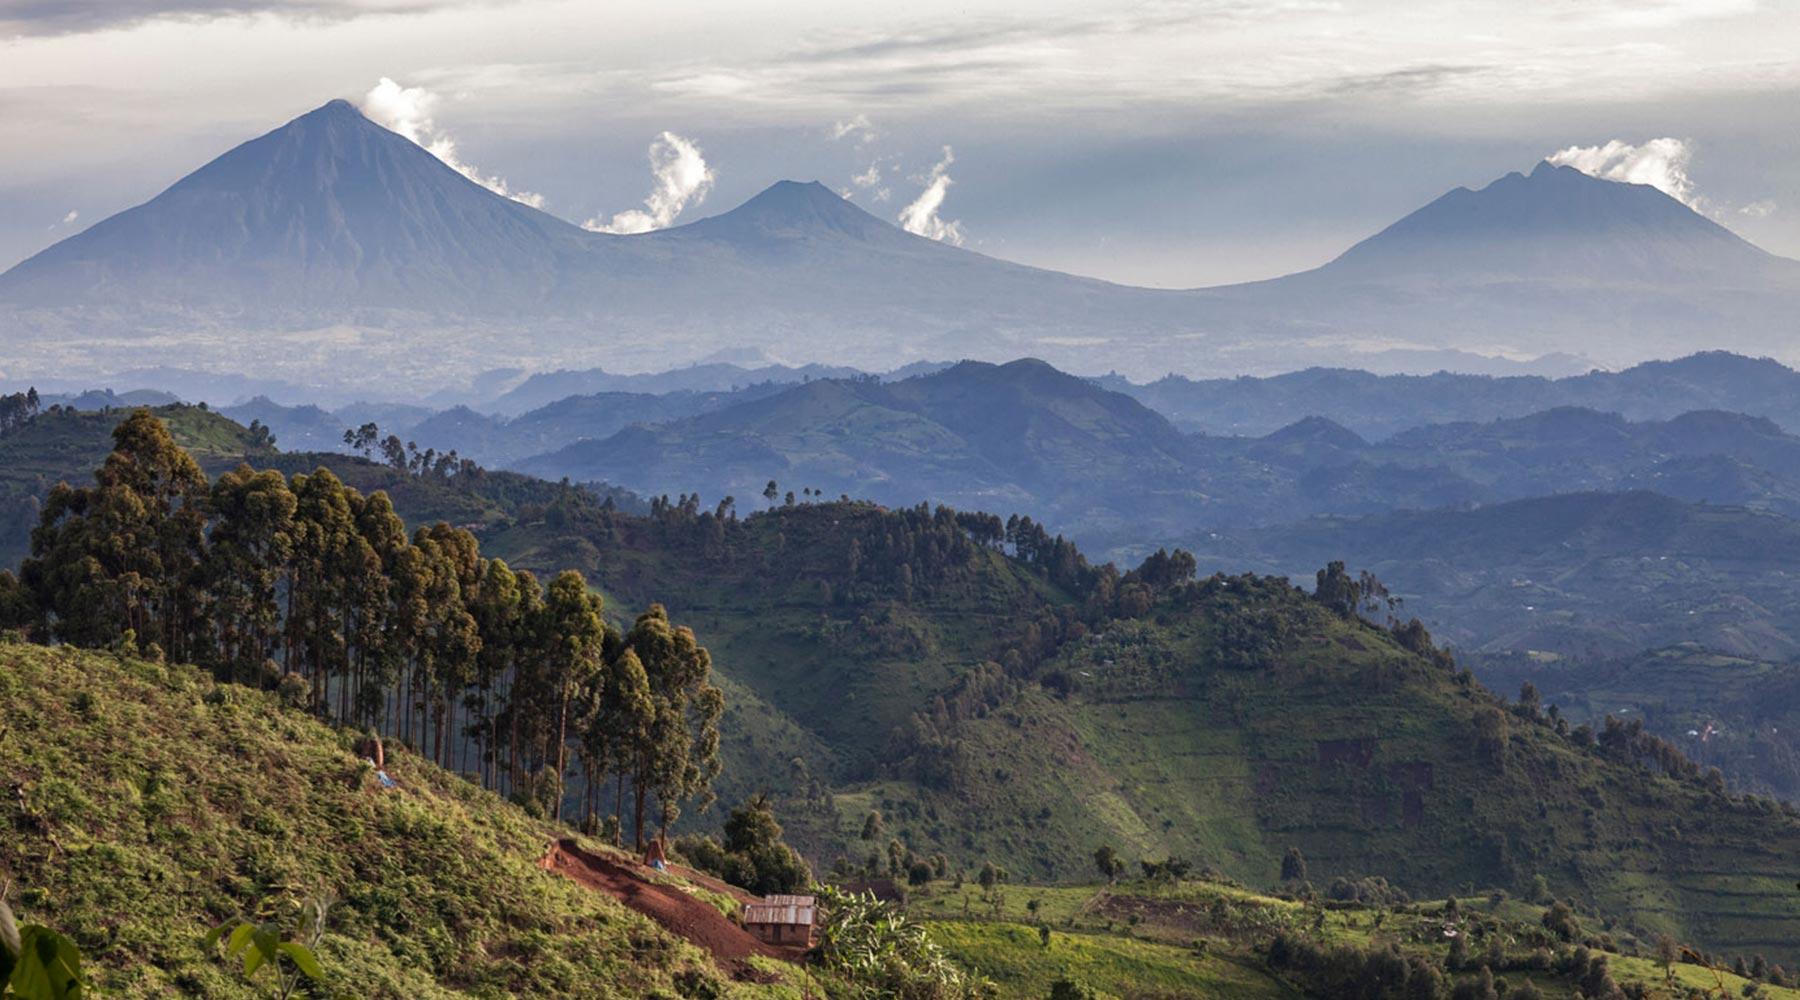 Rwanda volcanoes and landscape